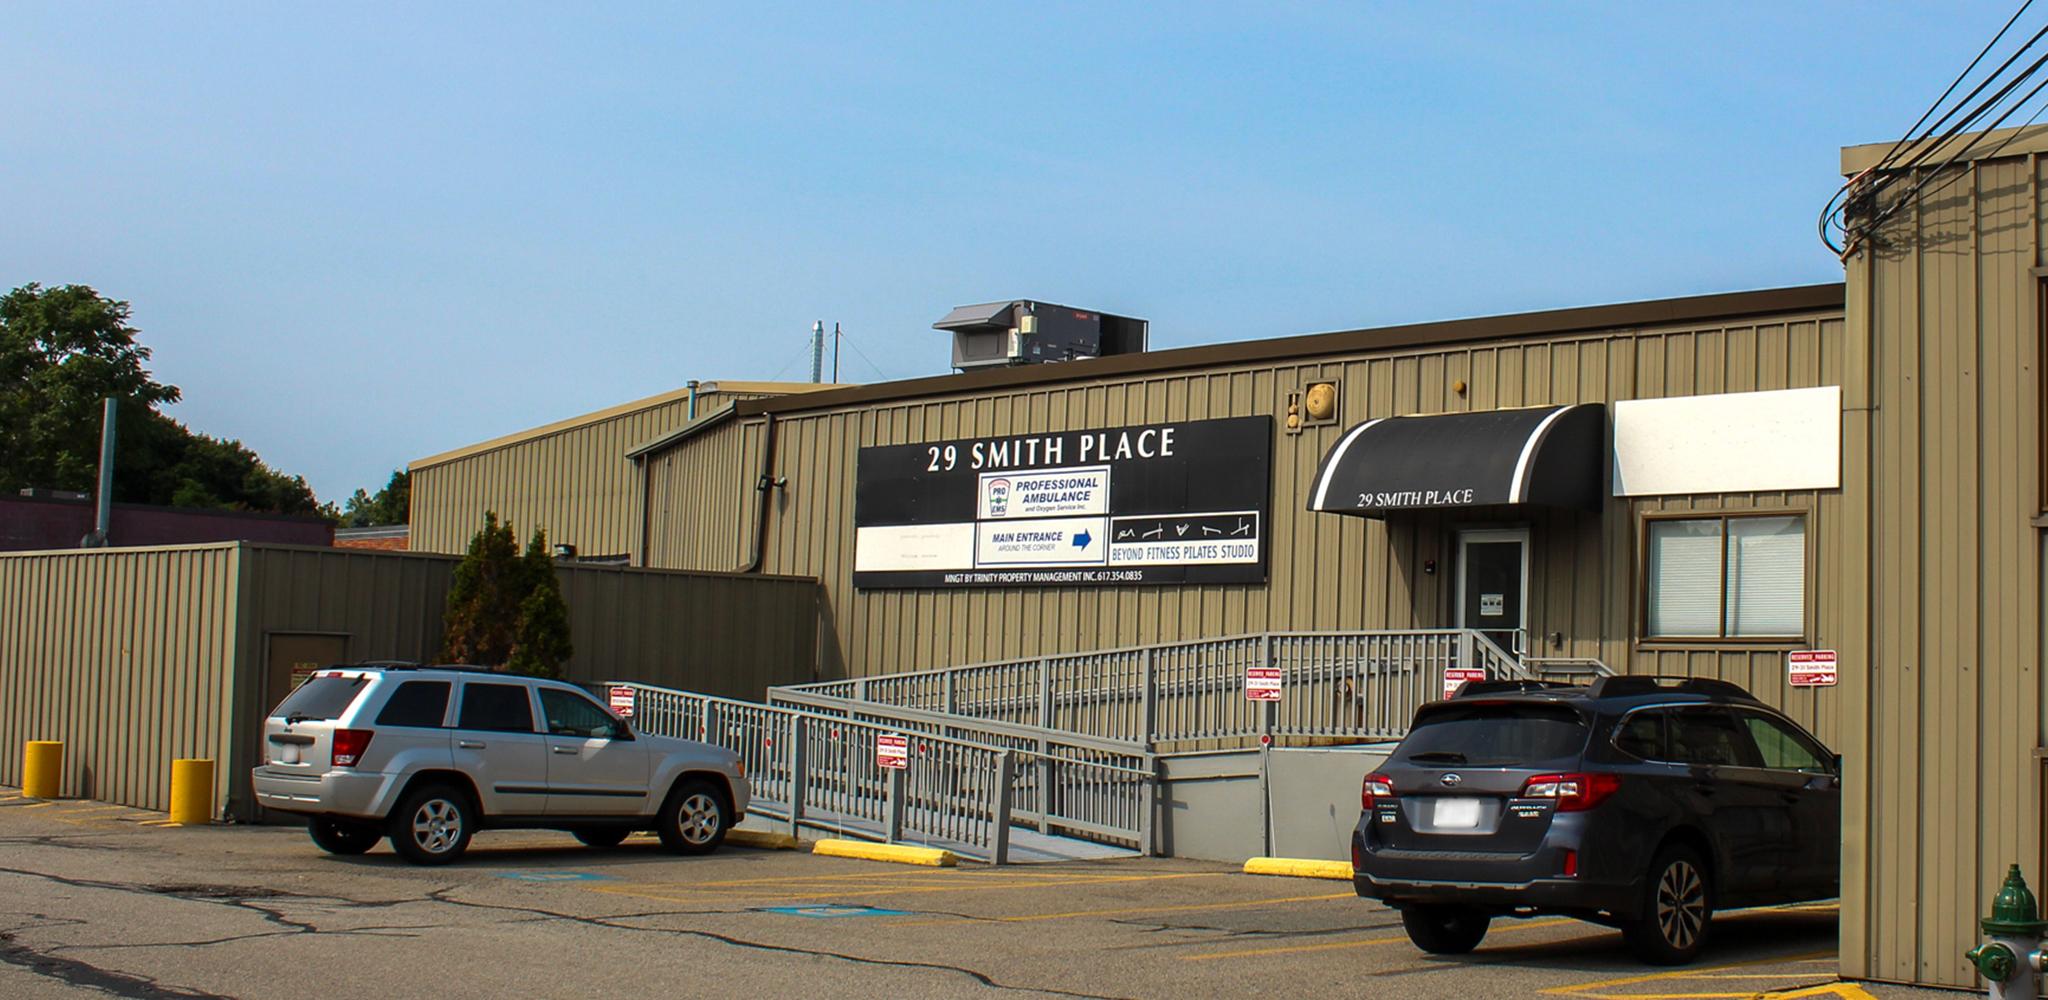 29 Smith Place Entrance